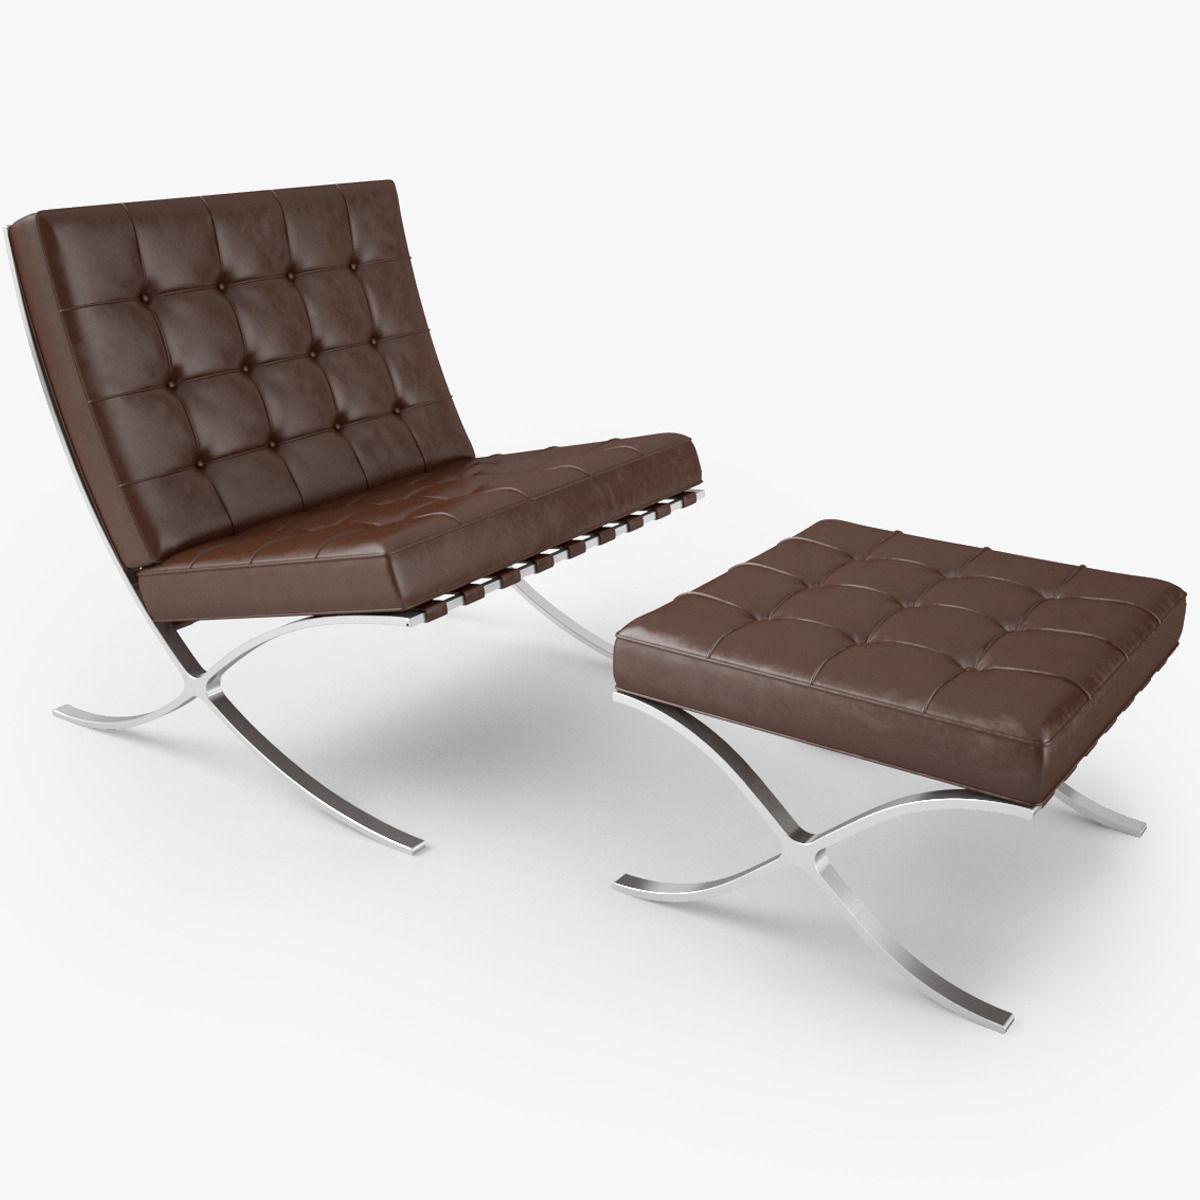 Barcelona chair brown -  Knoll Barcelona Chair 3d Model Max Obj Fbx Mtl 2